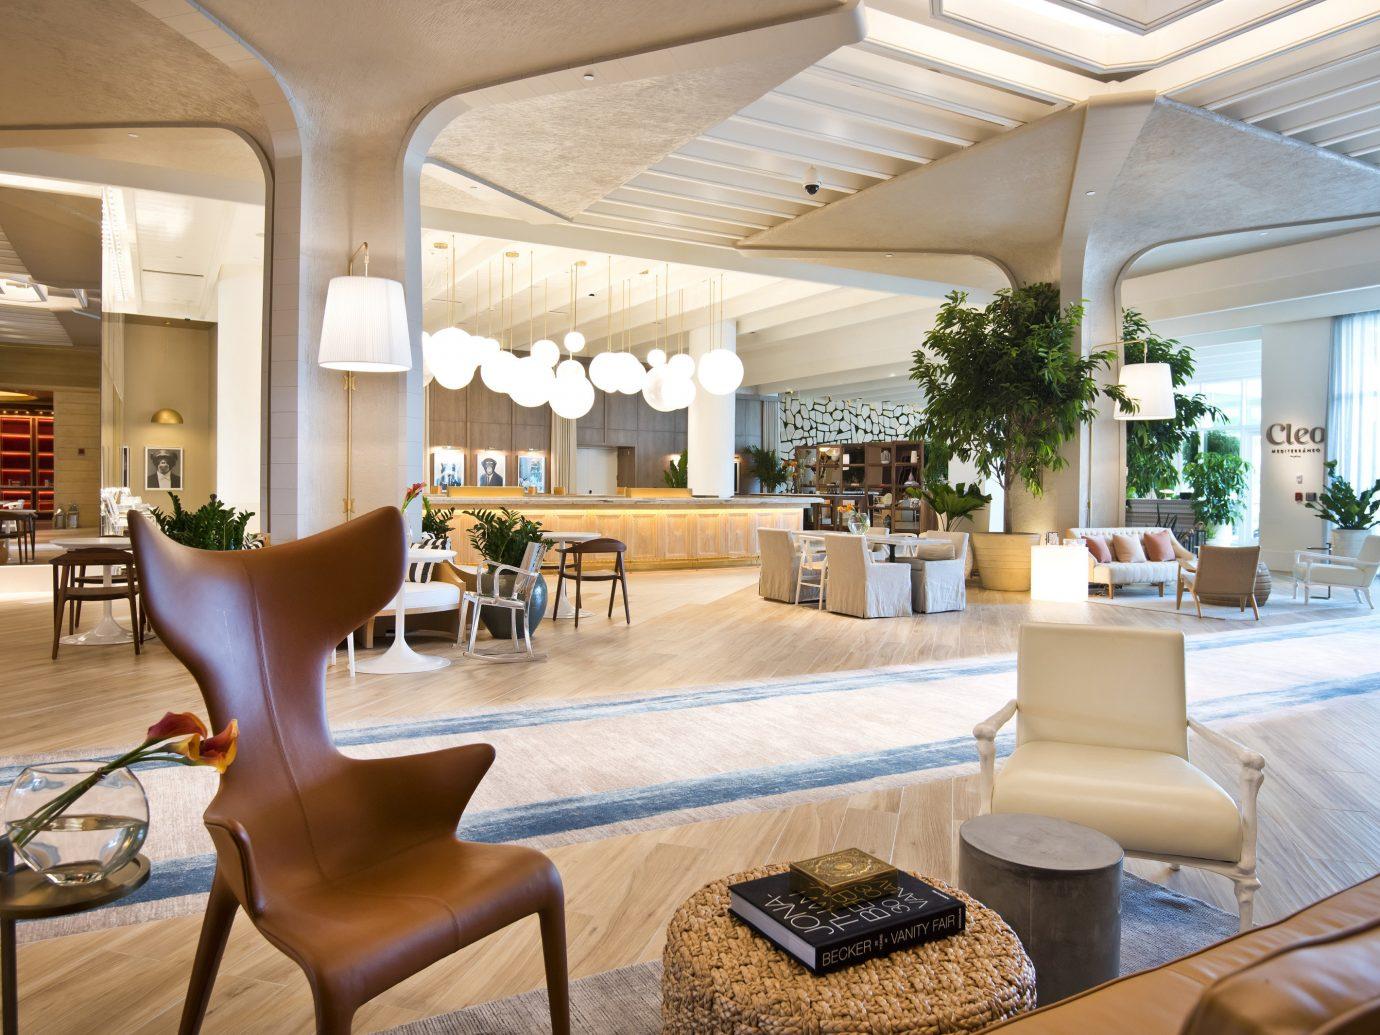 Bahamas caribbean Trip Ideas indoor table floor chair Living room interior design furniture ceiling estate real estate Lobby Resort living room penthouse apartment